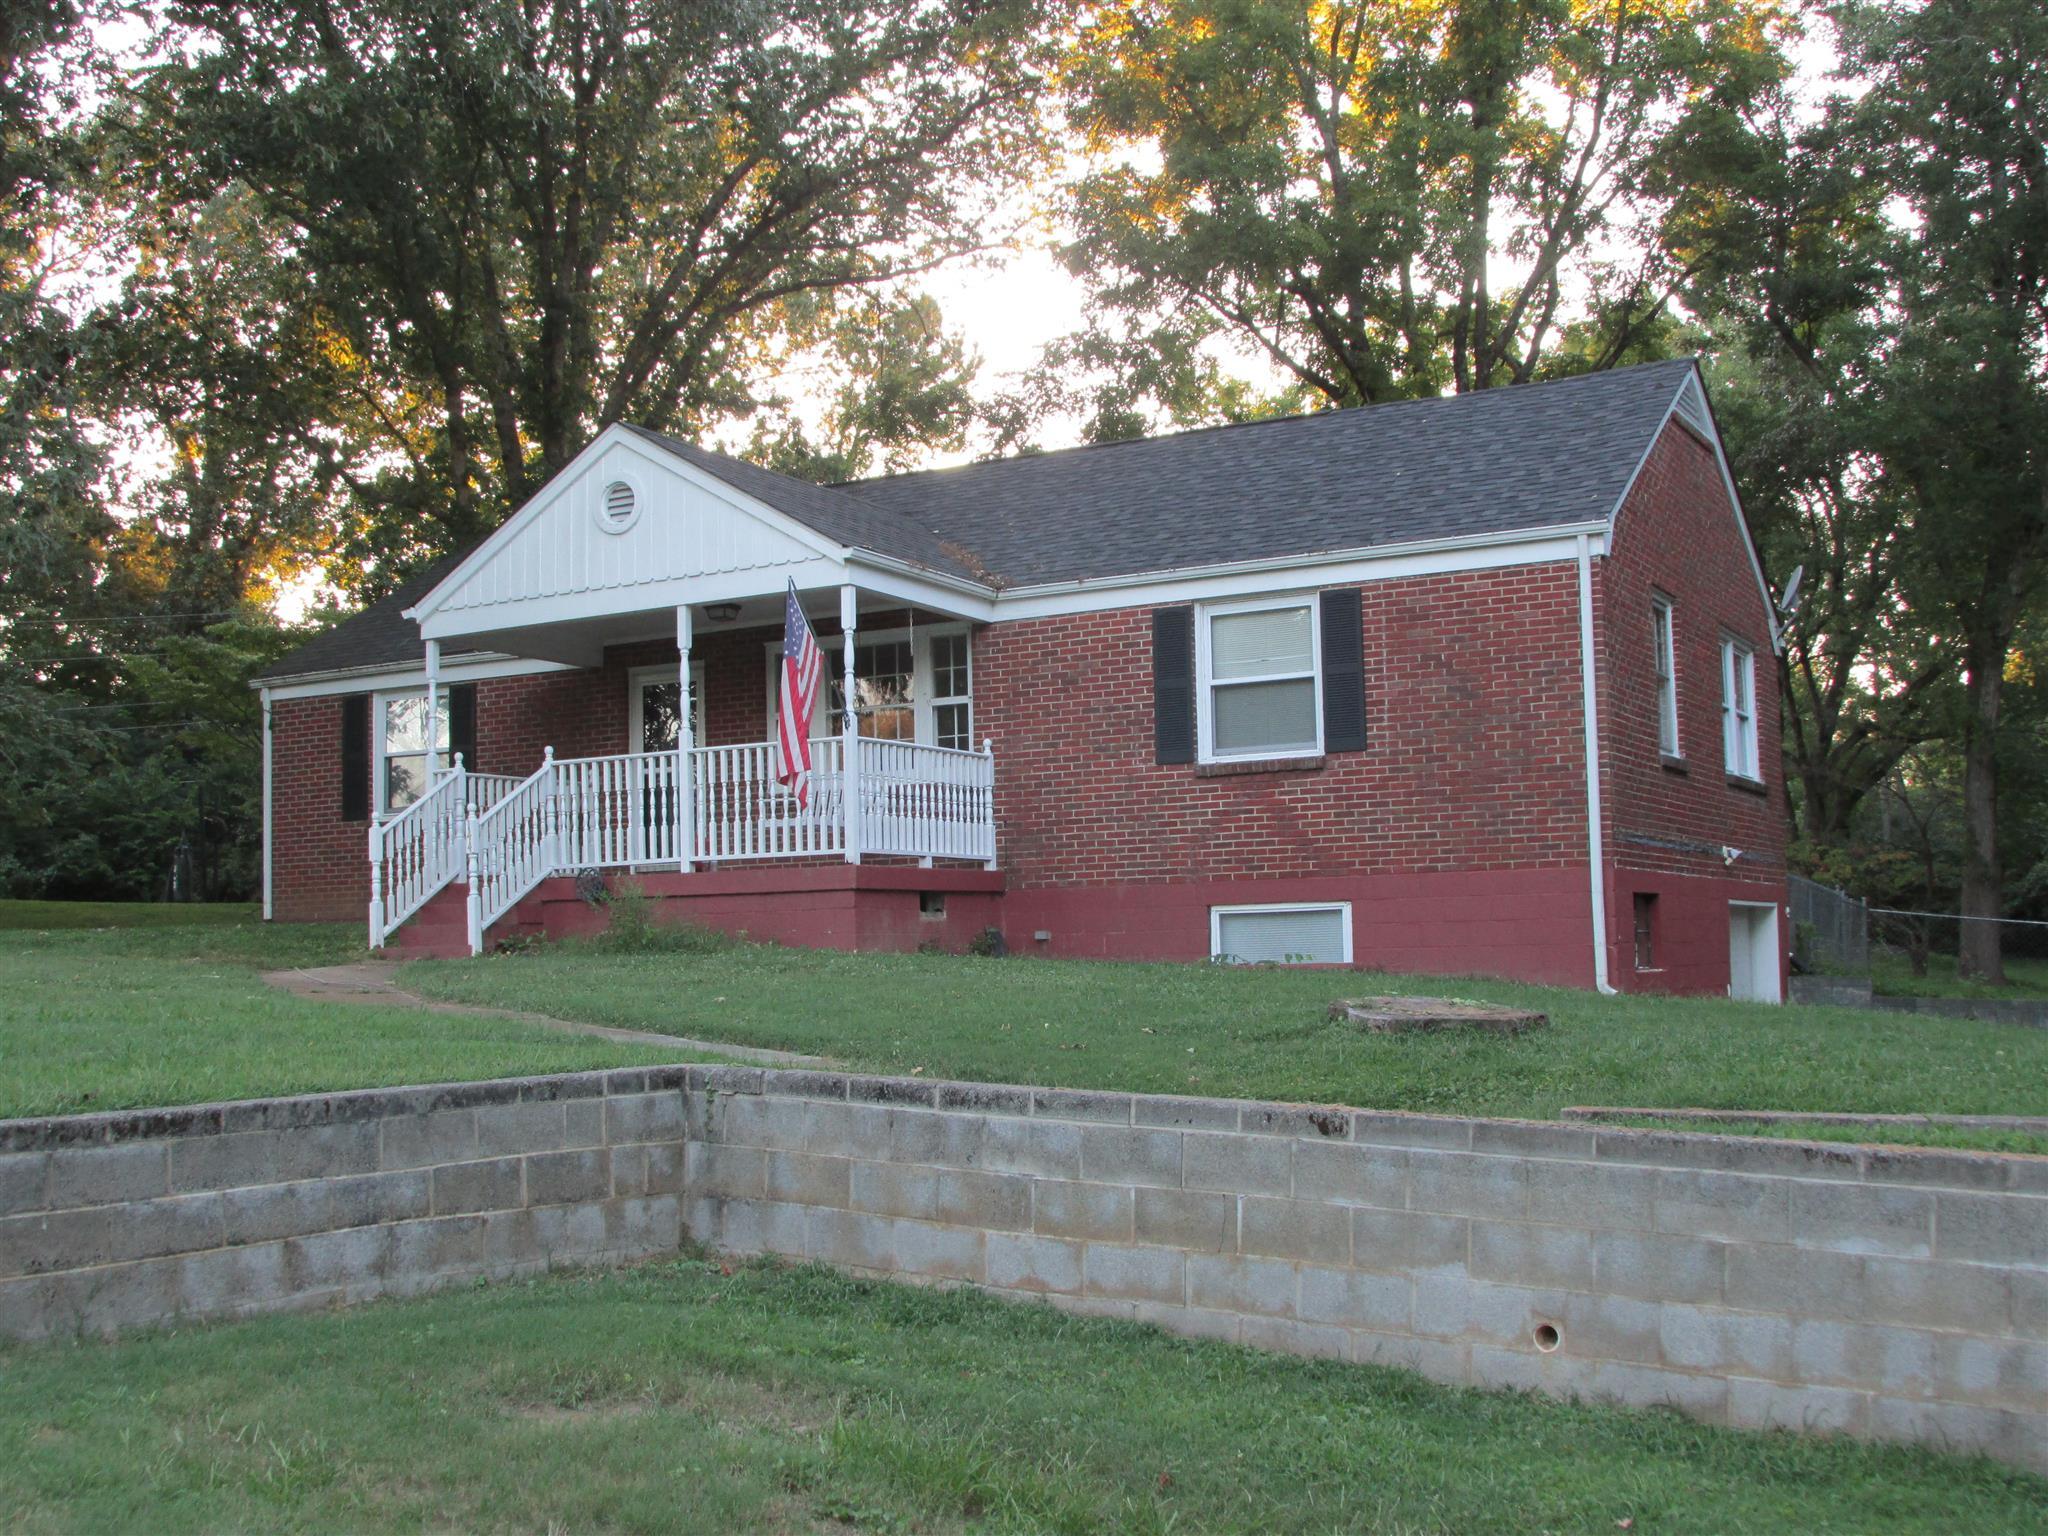 144 Allenwood Dr, Clarksville, TN 37043 - Clarksville, TN real estate listing